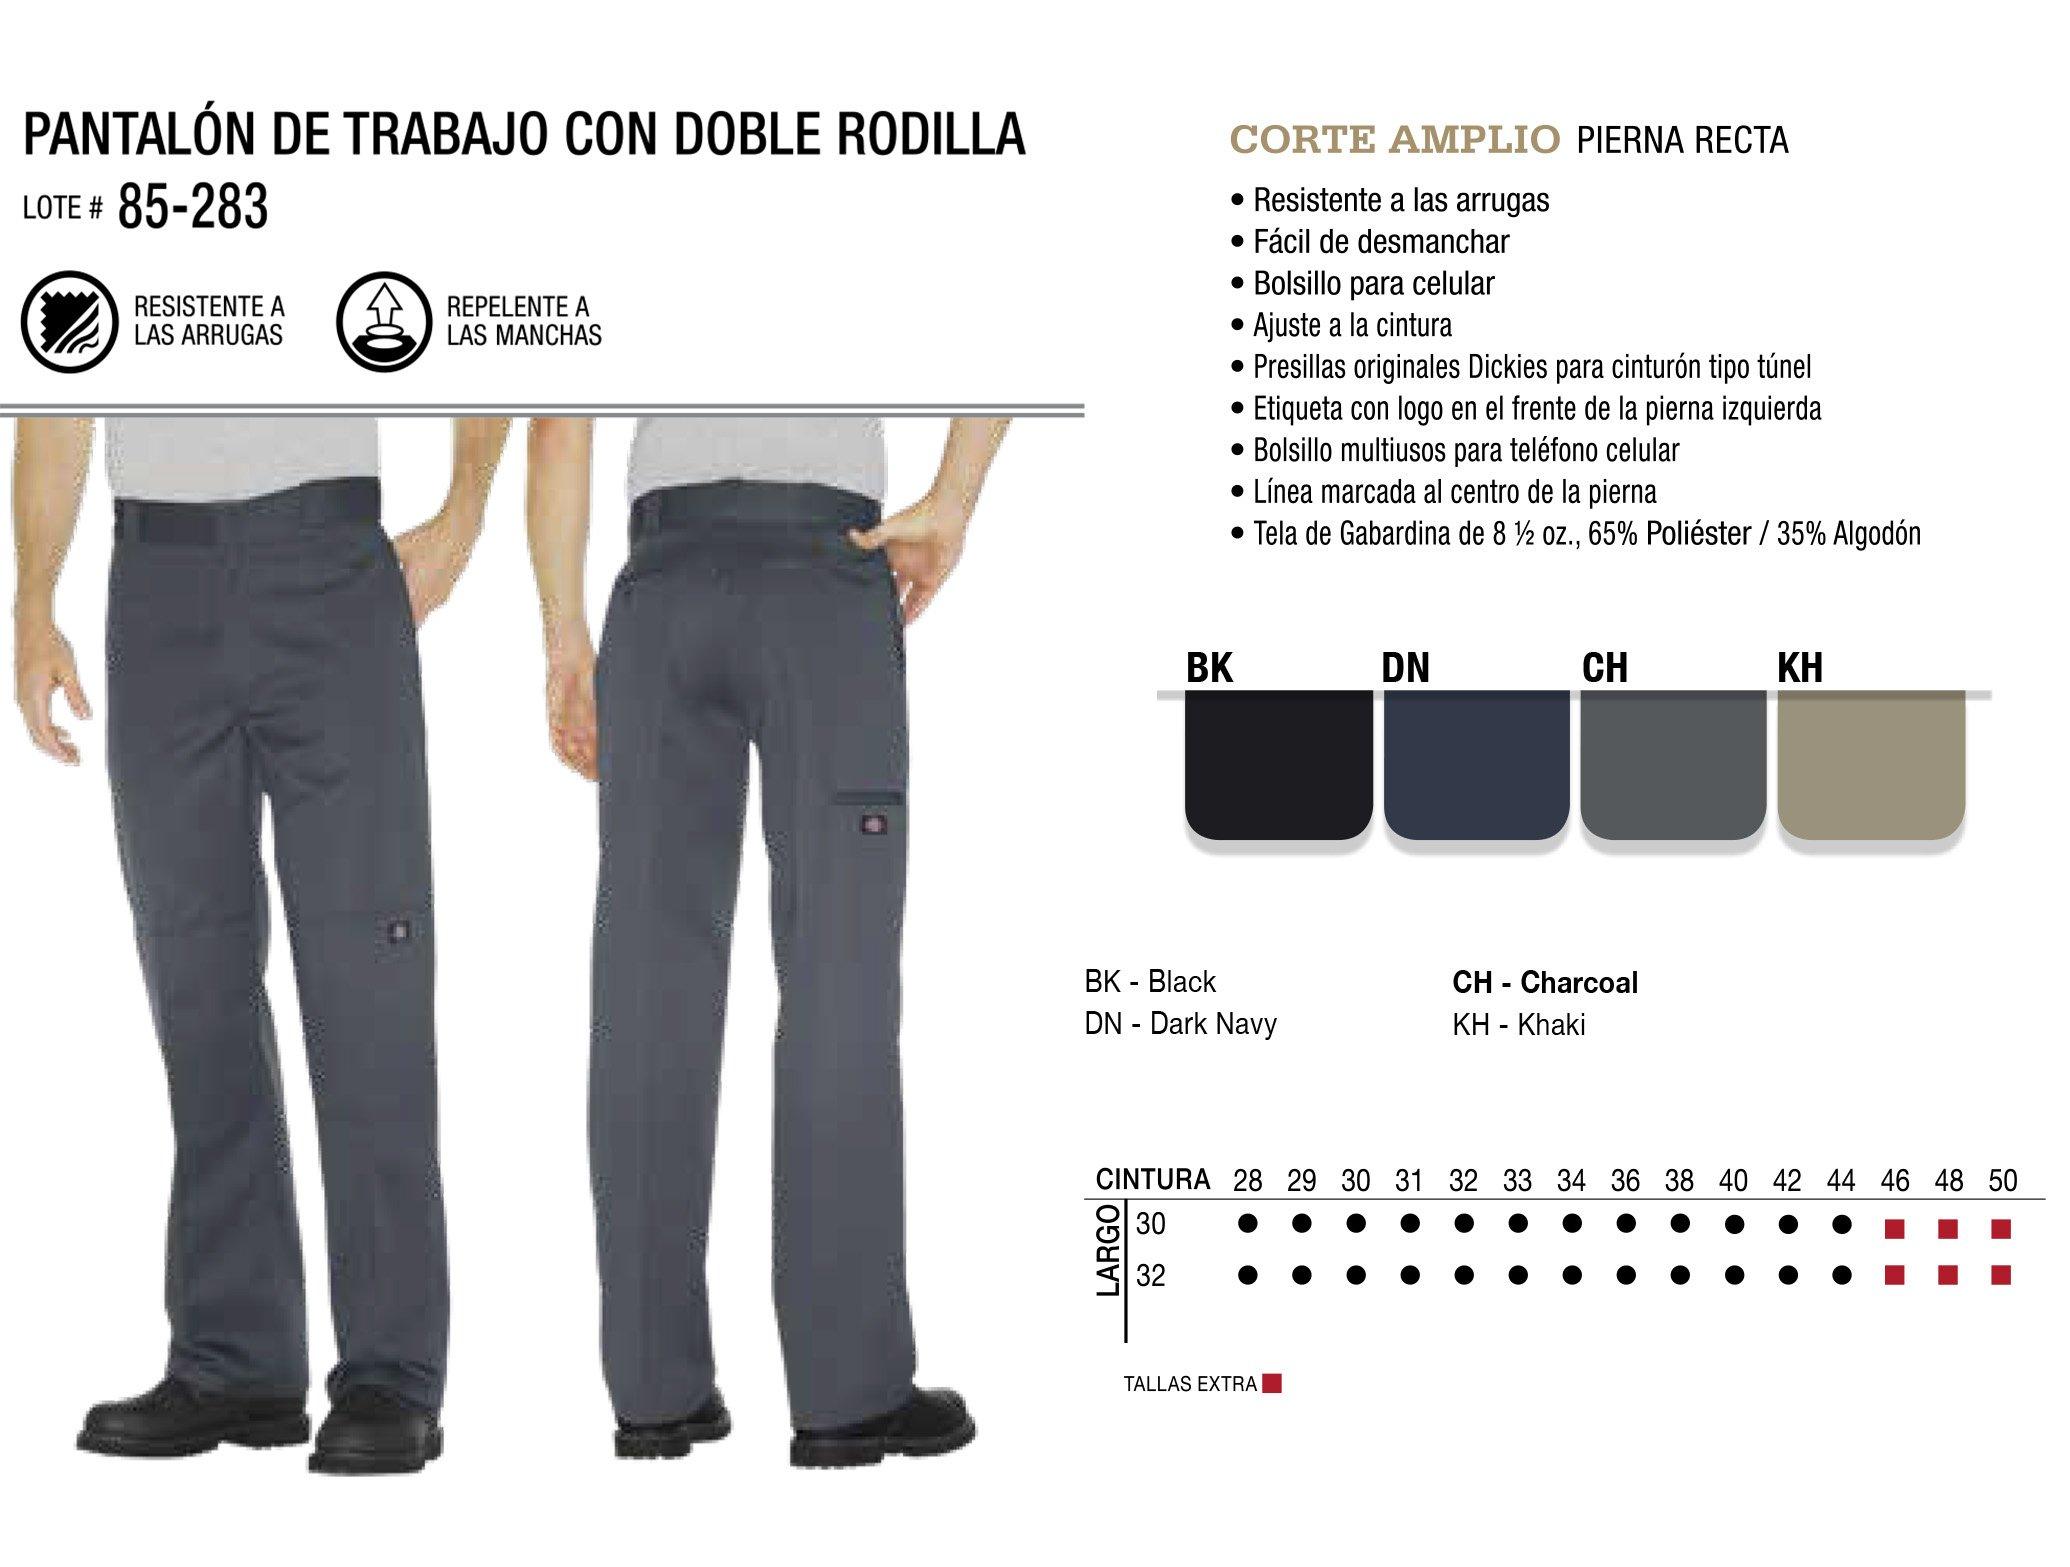 Pantalón de Trabajo con Doble Rodilla. Corte Amplio. 85-283.